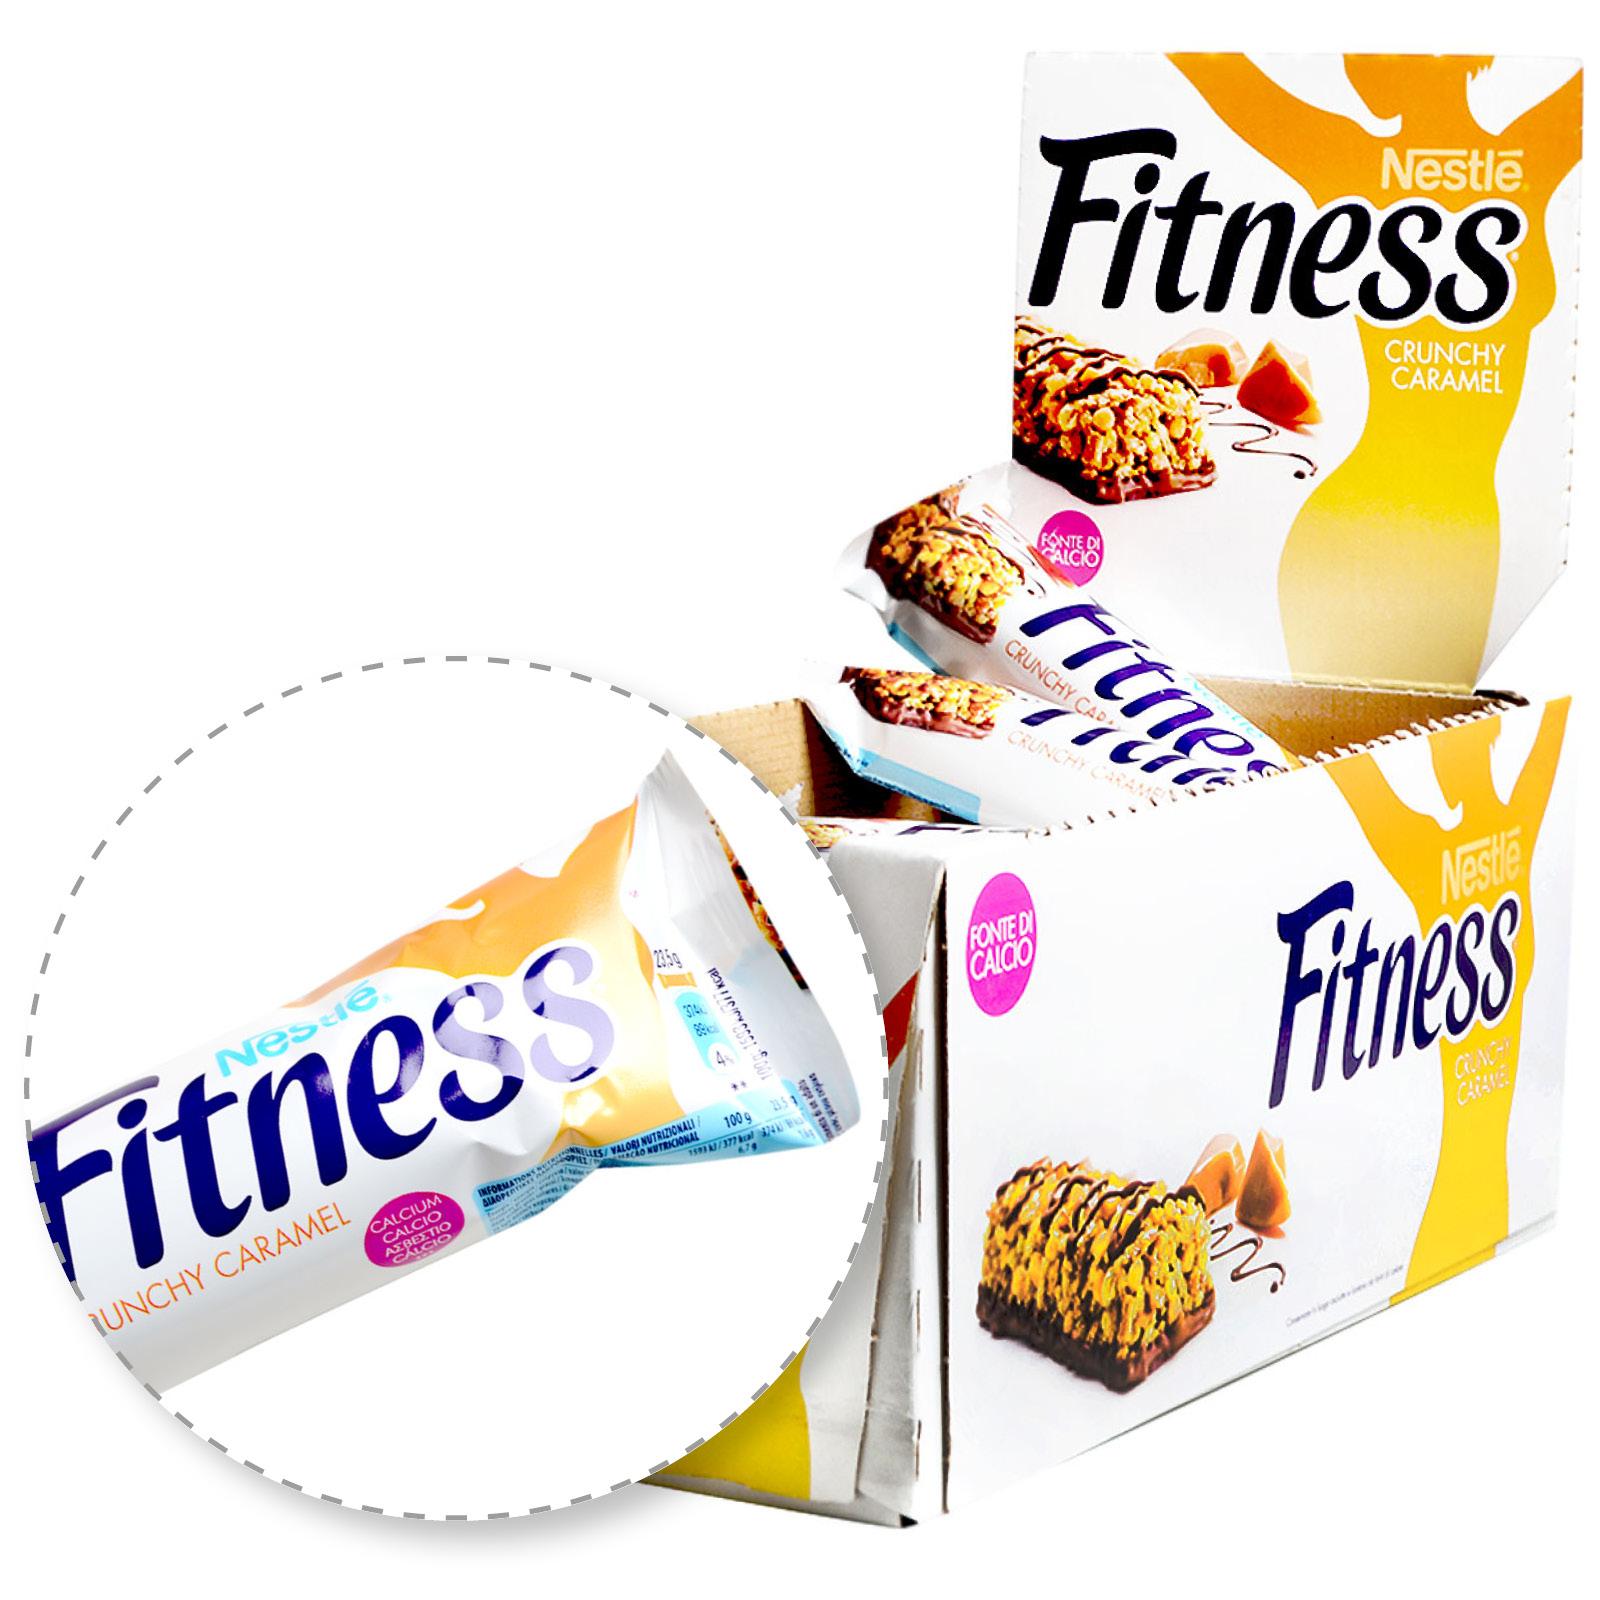 fitness-caramello (1)